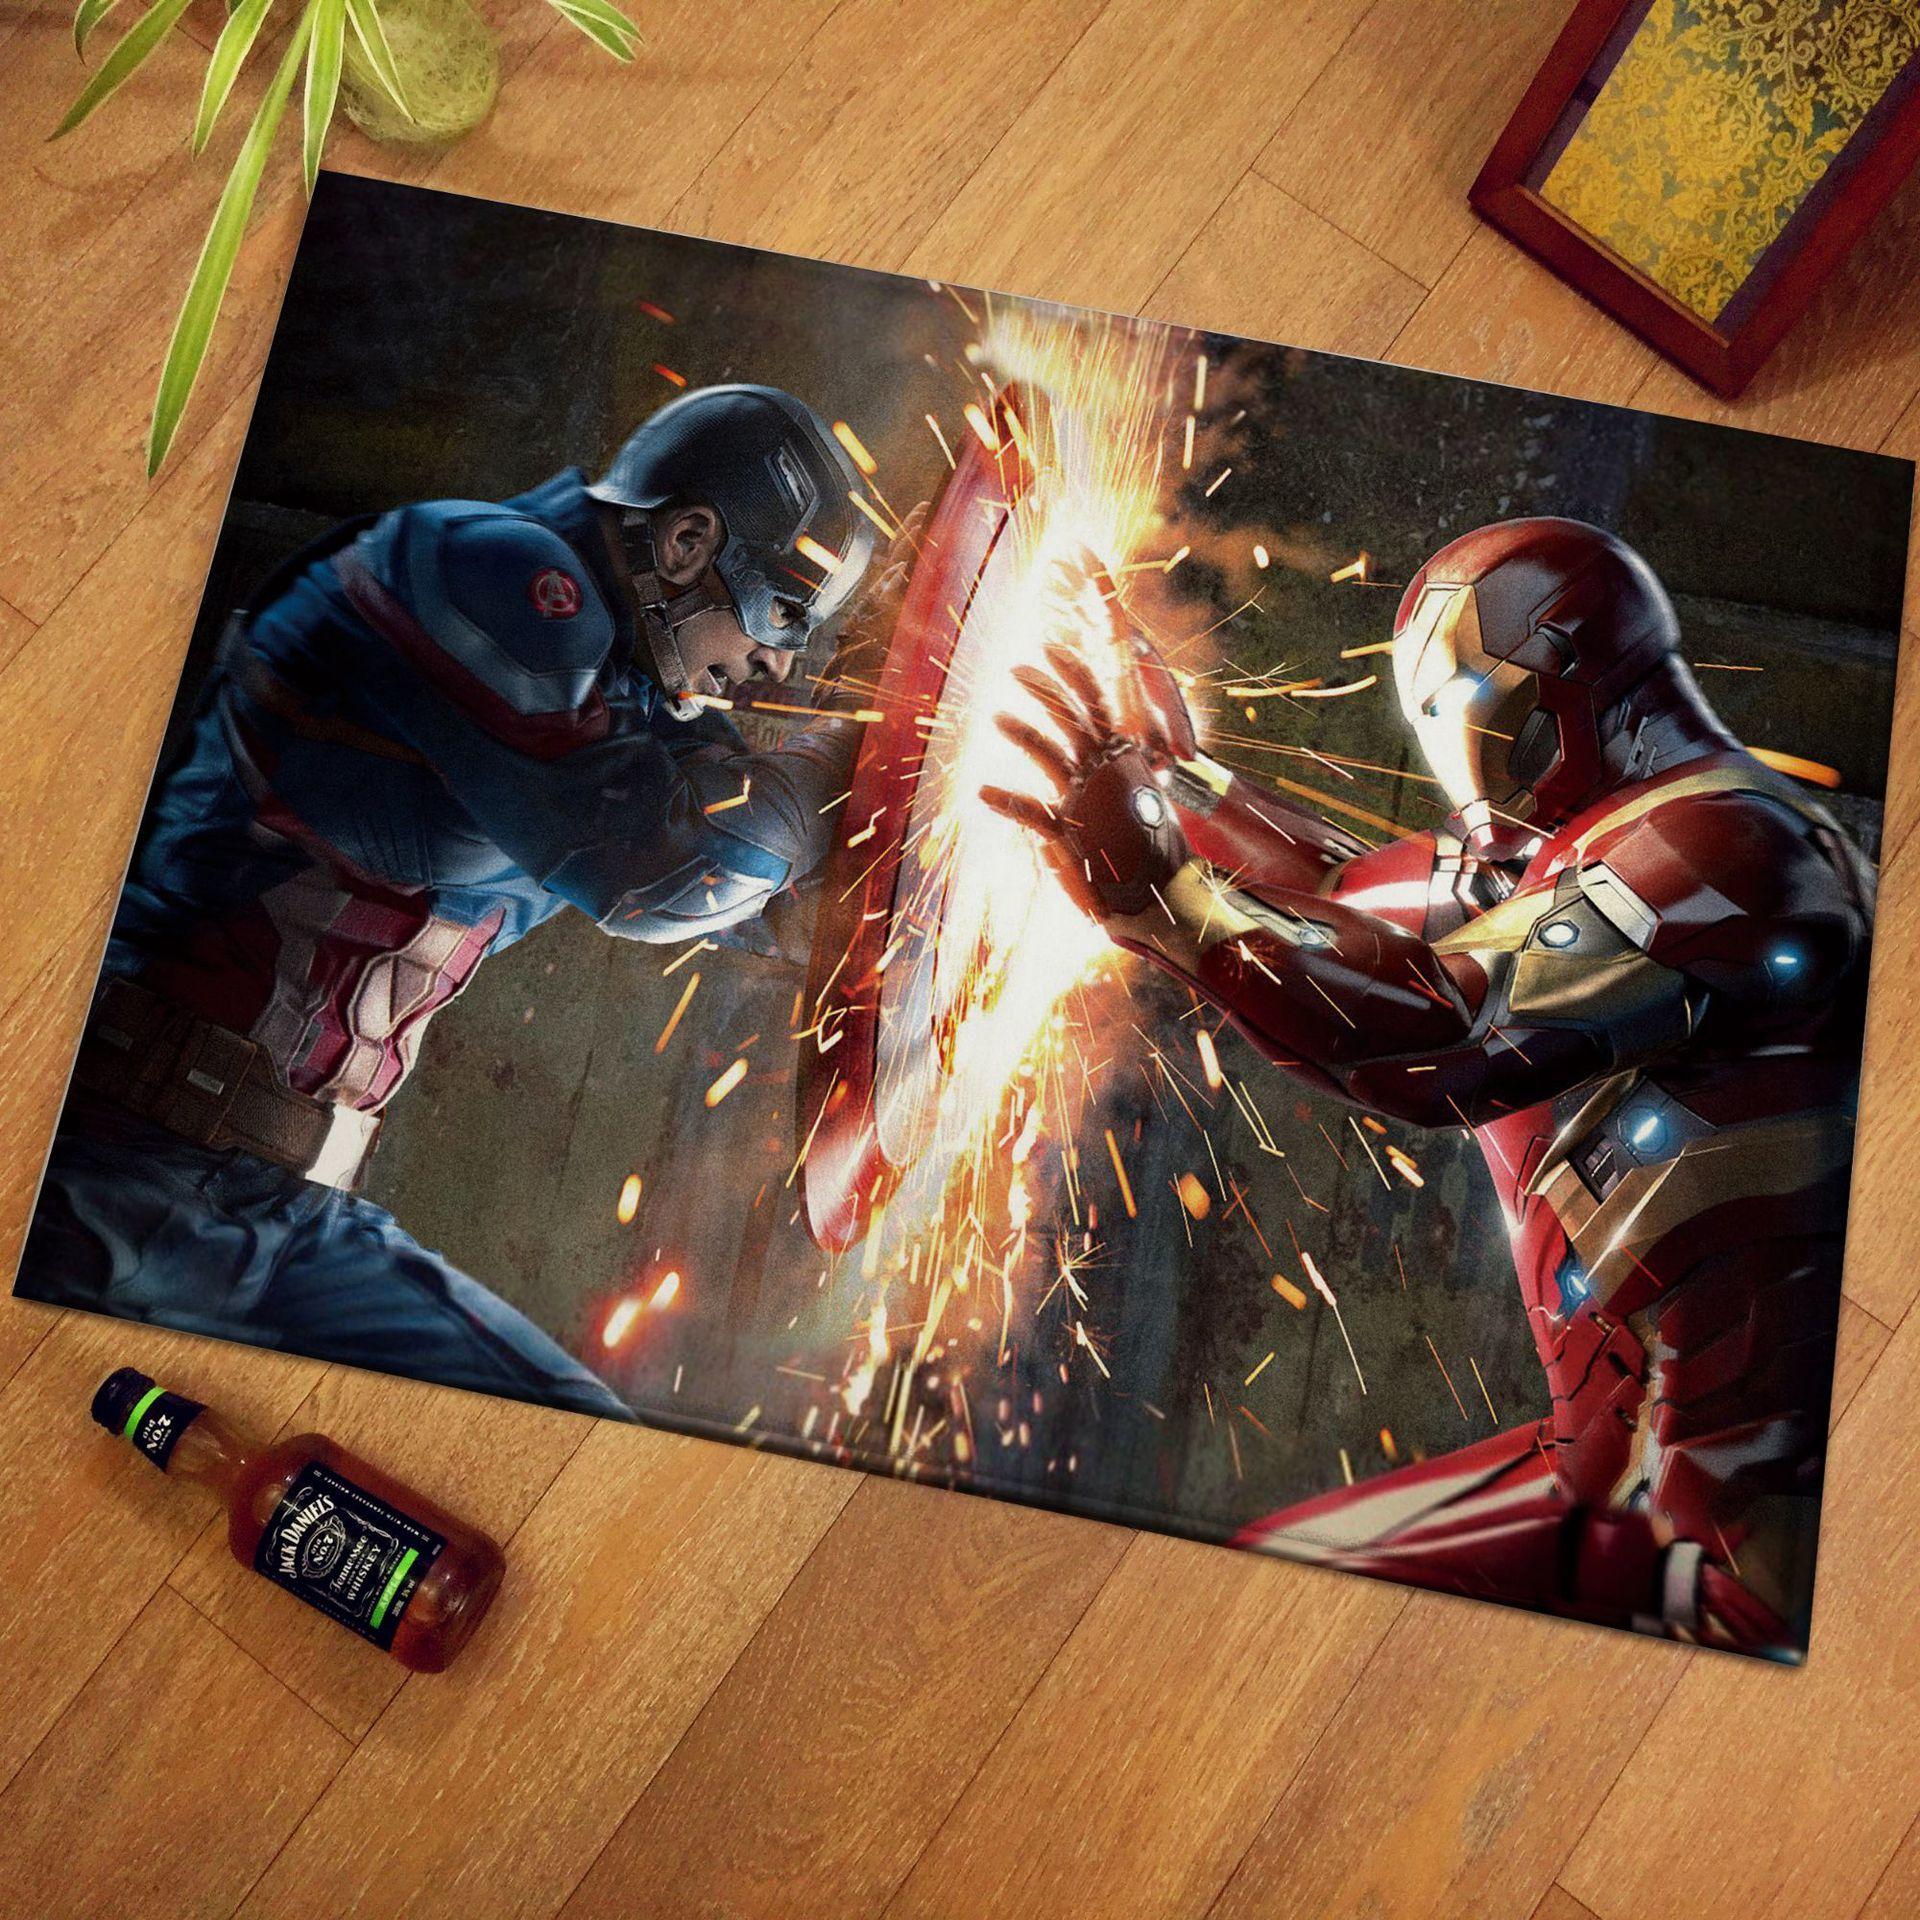 40-60cm-font-b-marvel-b-font-toys-the-avengers-plush-carpet-iron-man-captain-america-batman-rug-cotton-christmas-gift-for-kids-drop-shipping